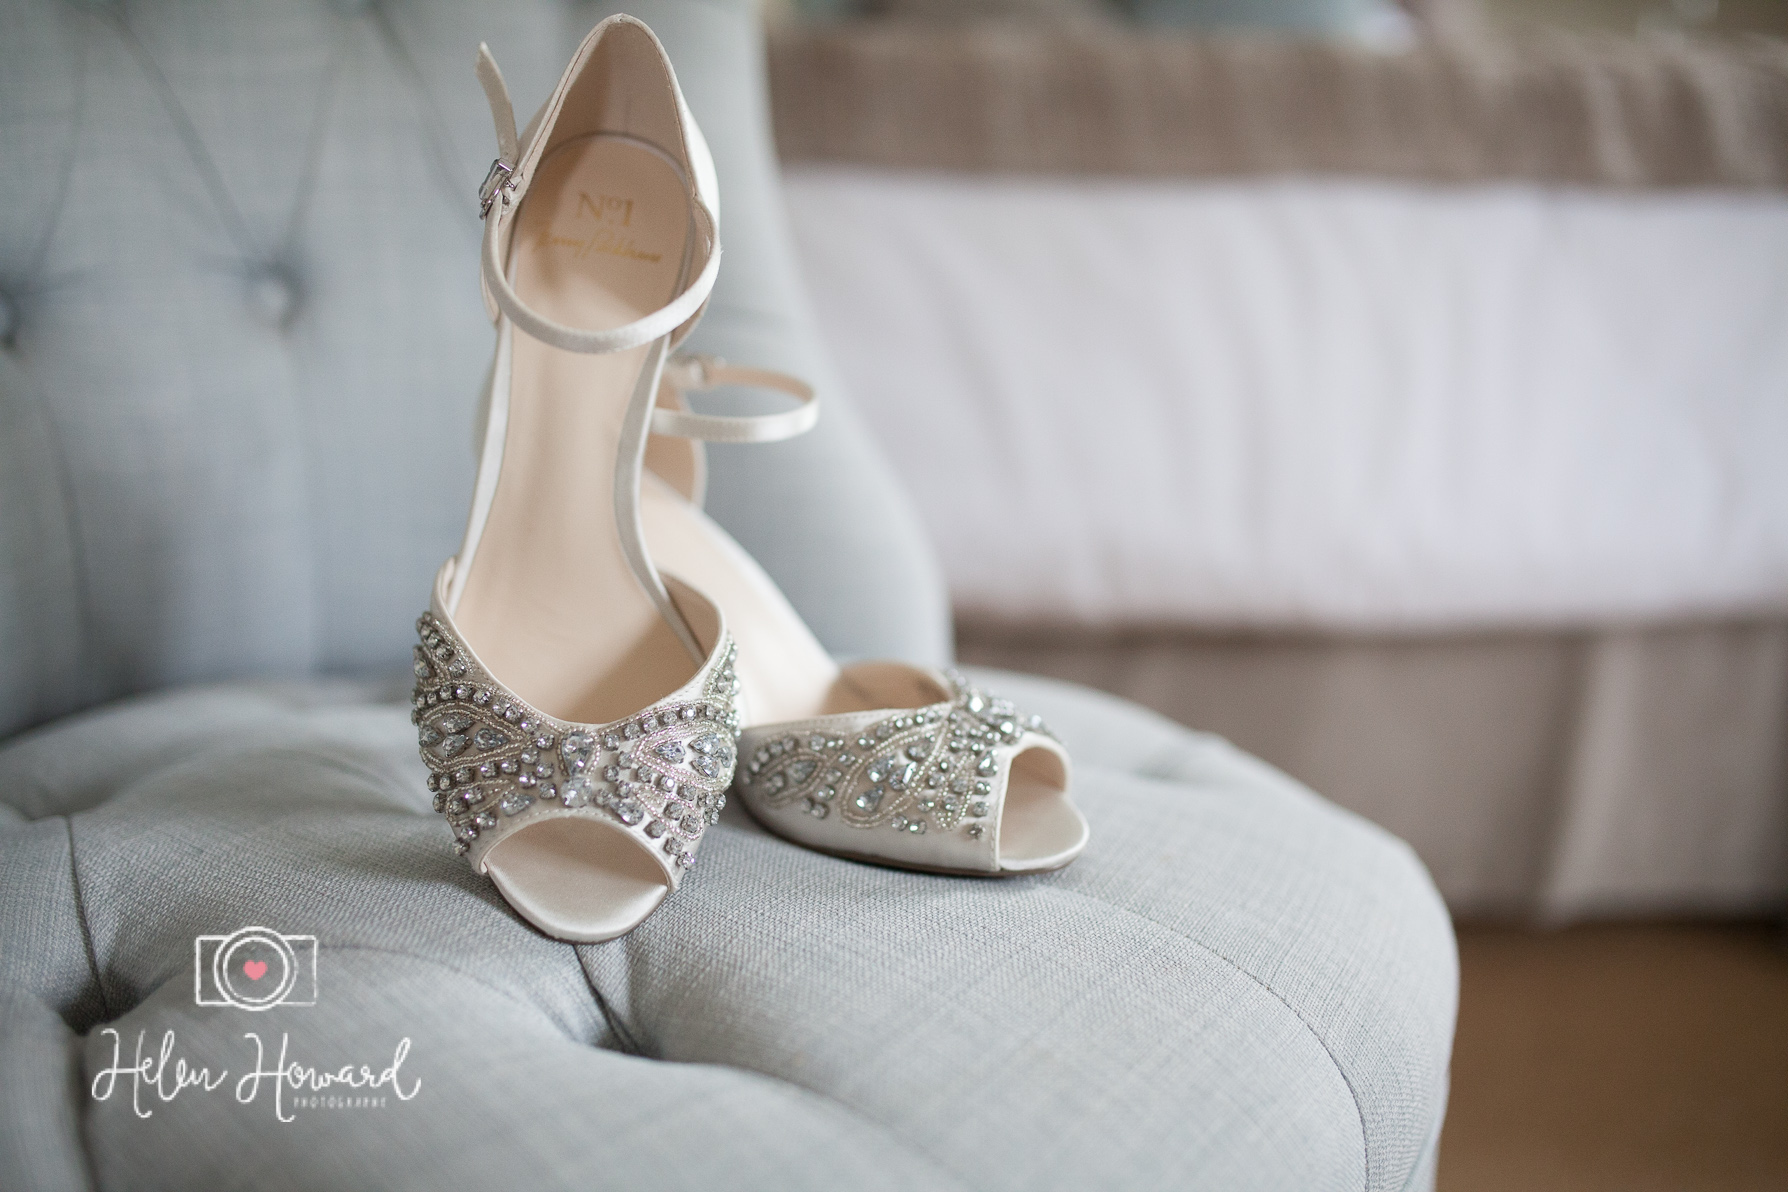 Helen Howard Photography Packington Moor Wedding-12.jpg